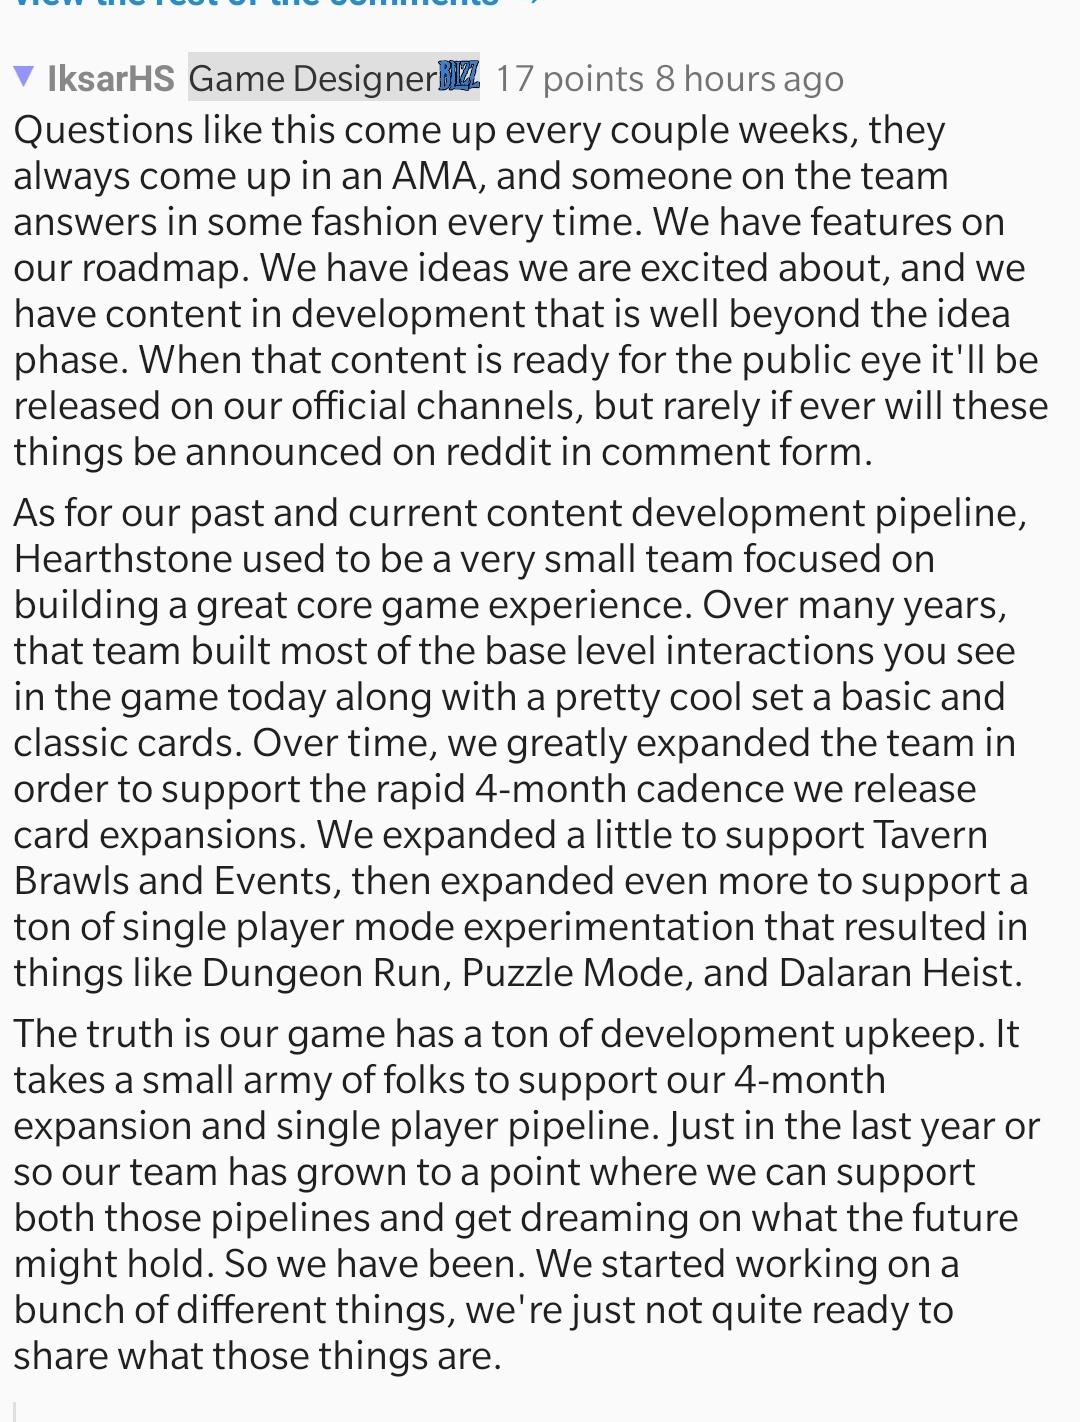 Iksar表示製作團隊新增人手後已經有足夠人力去進行新內容的開發。